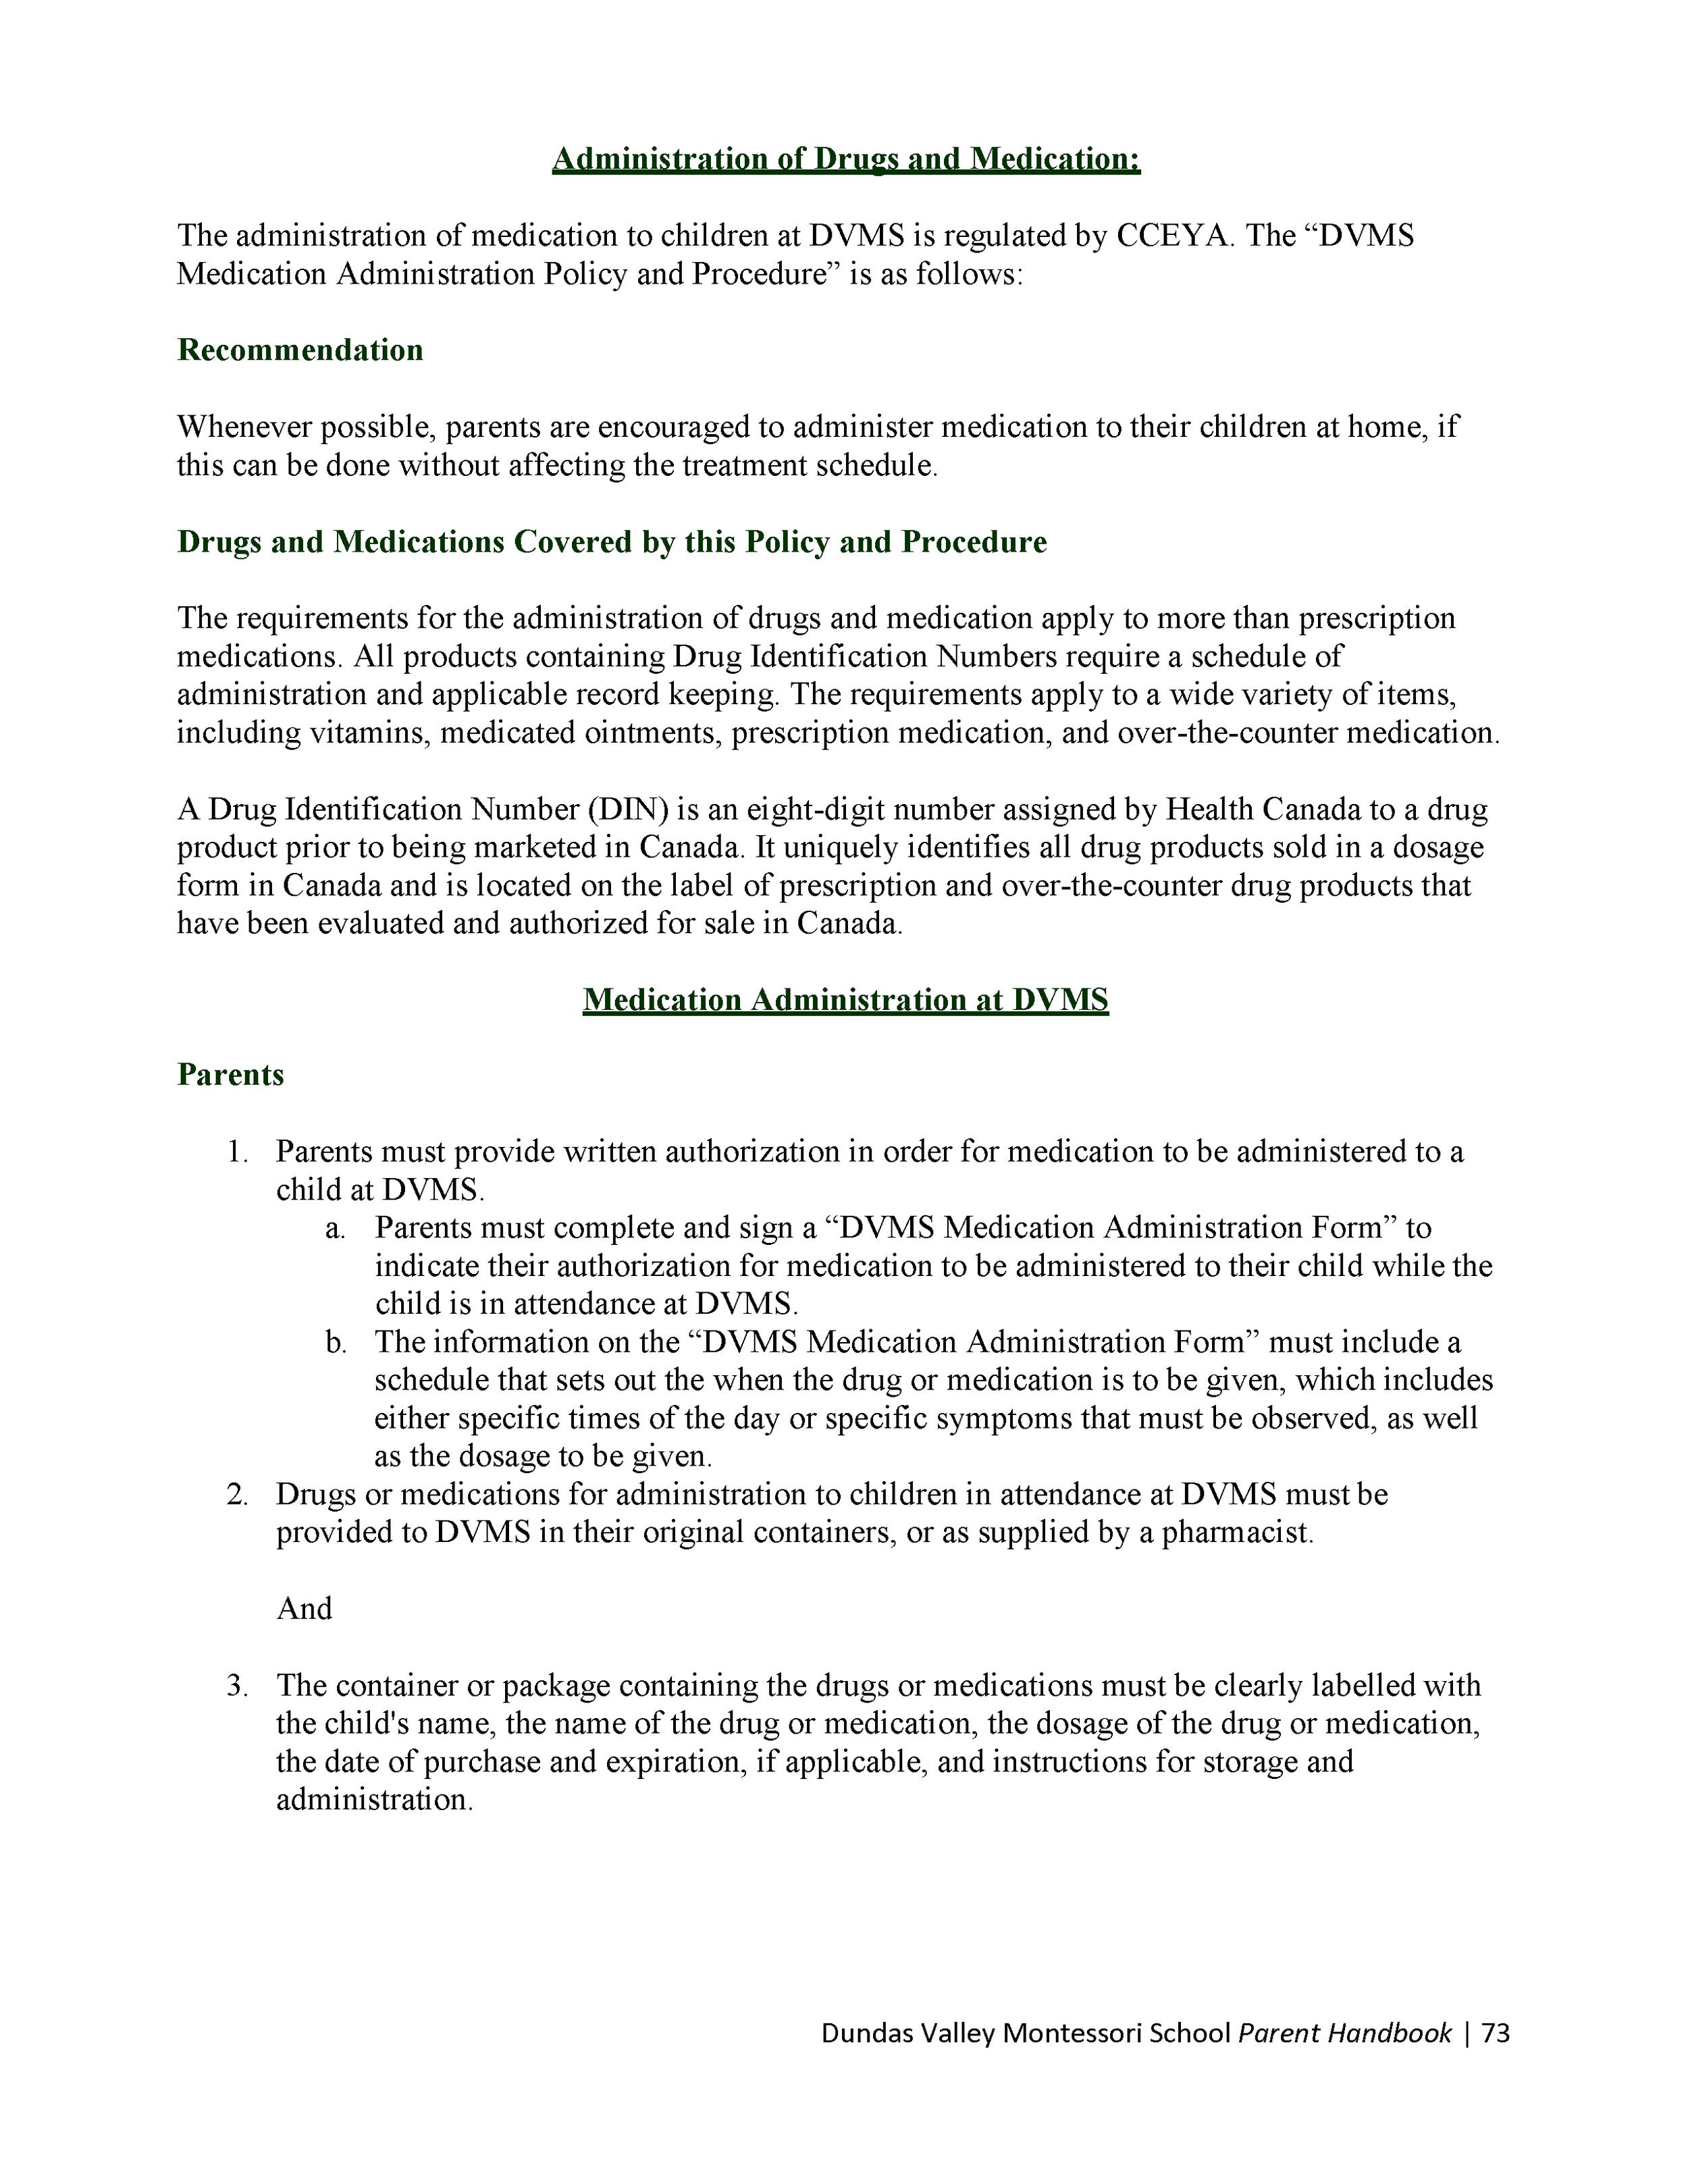 DVMS-Parent-Handbook-19-20_Page_075.png